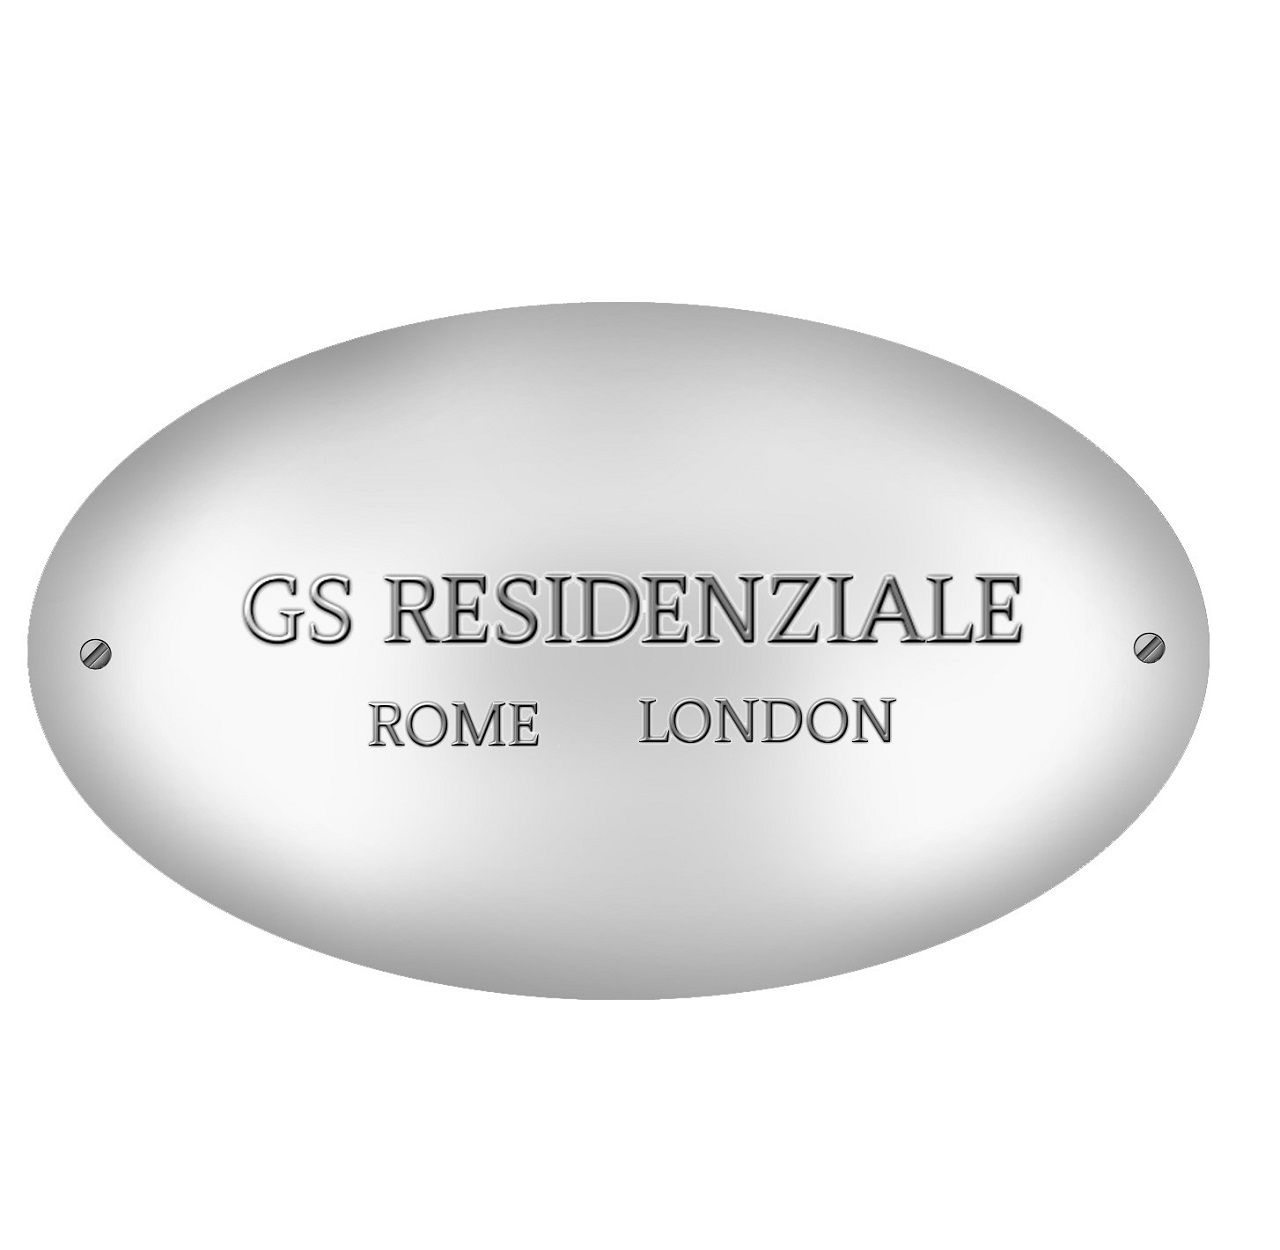 GS Residenziale Giovanna Scarpellino